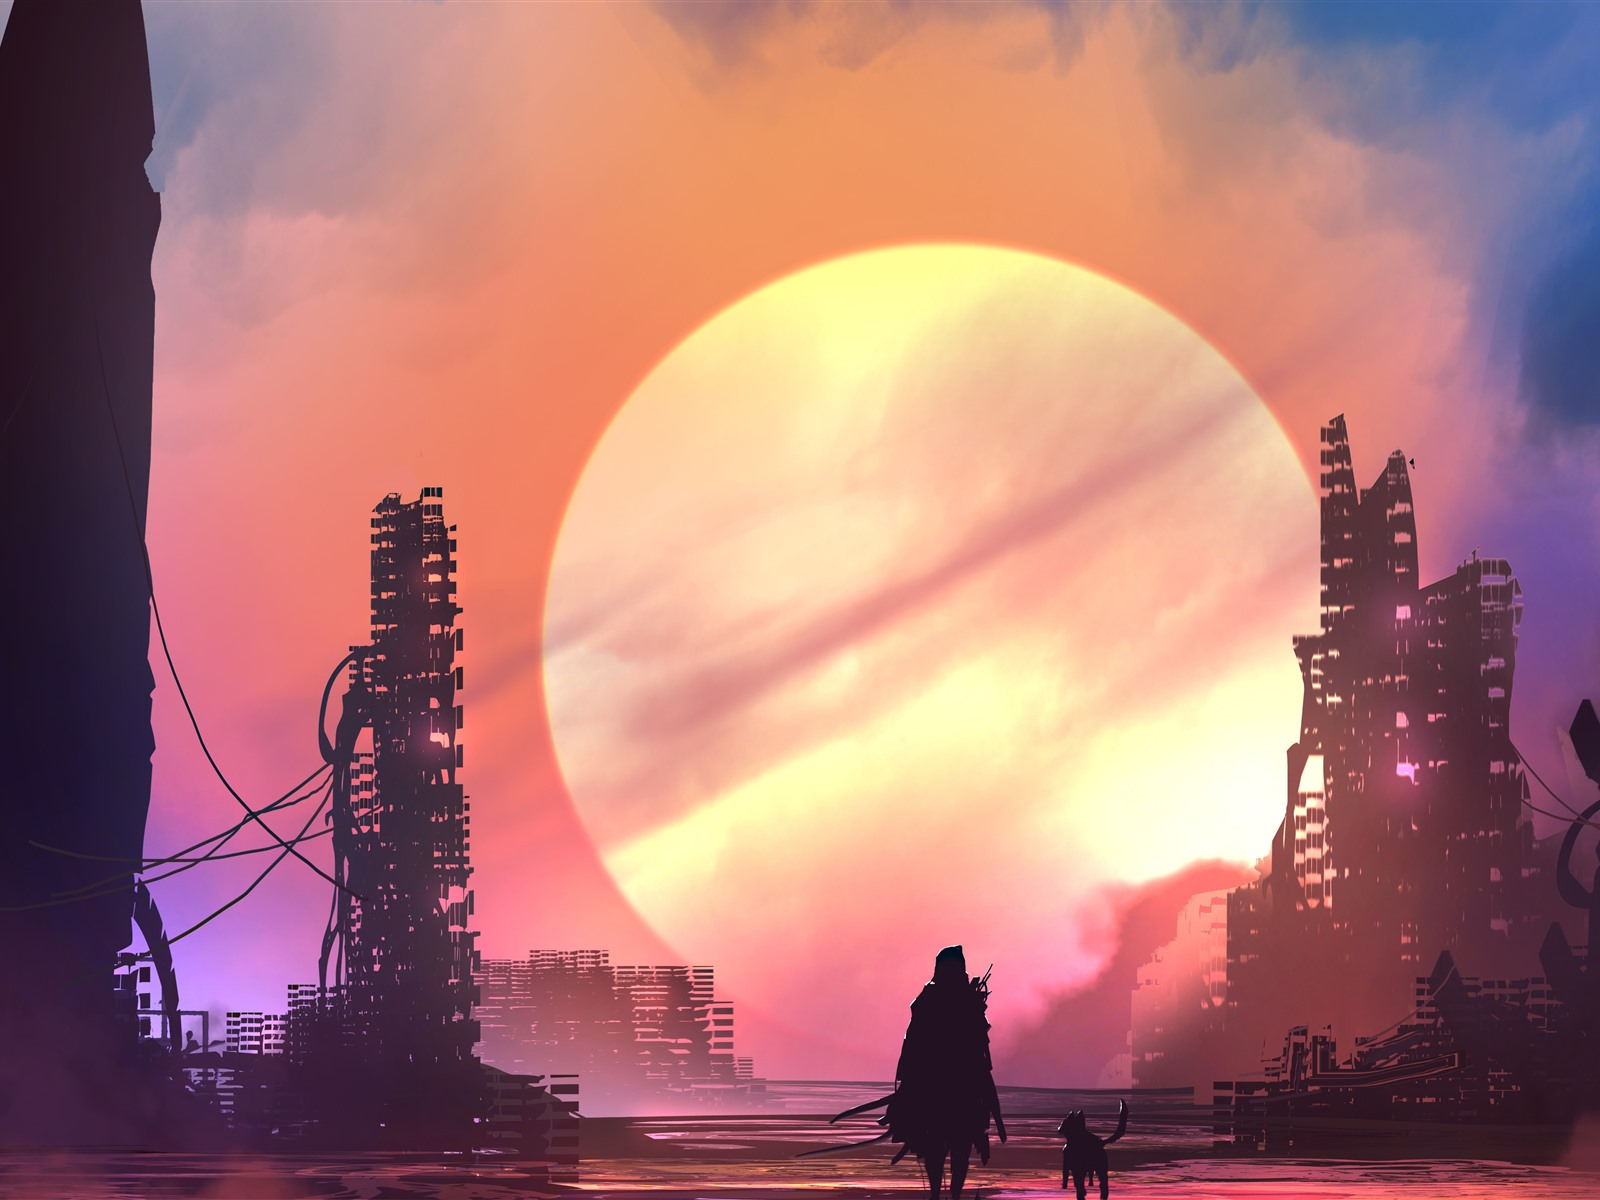 Солнце будущее картинки